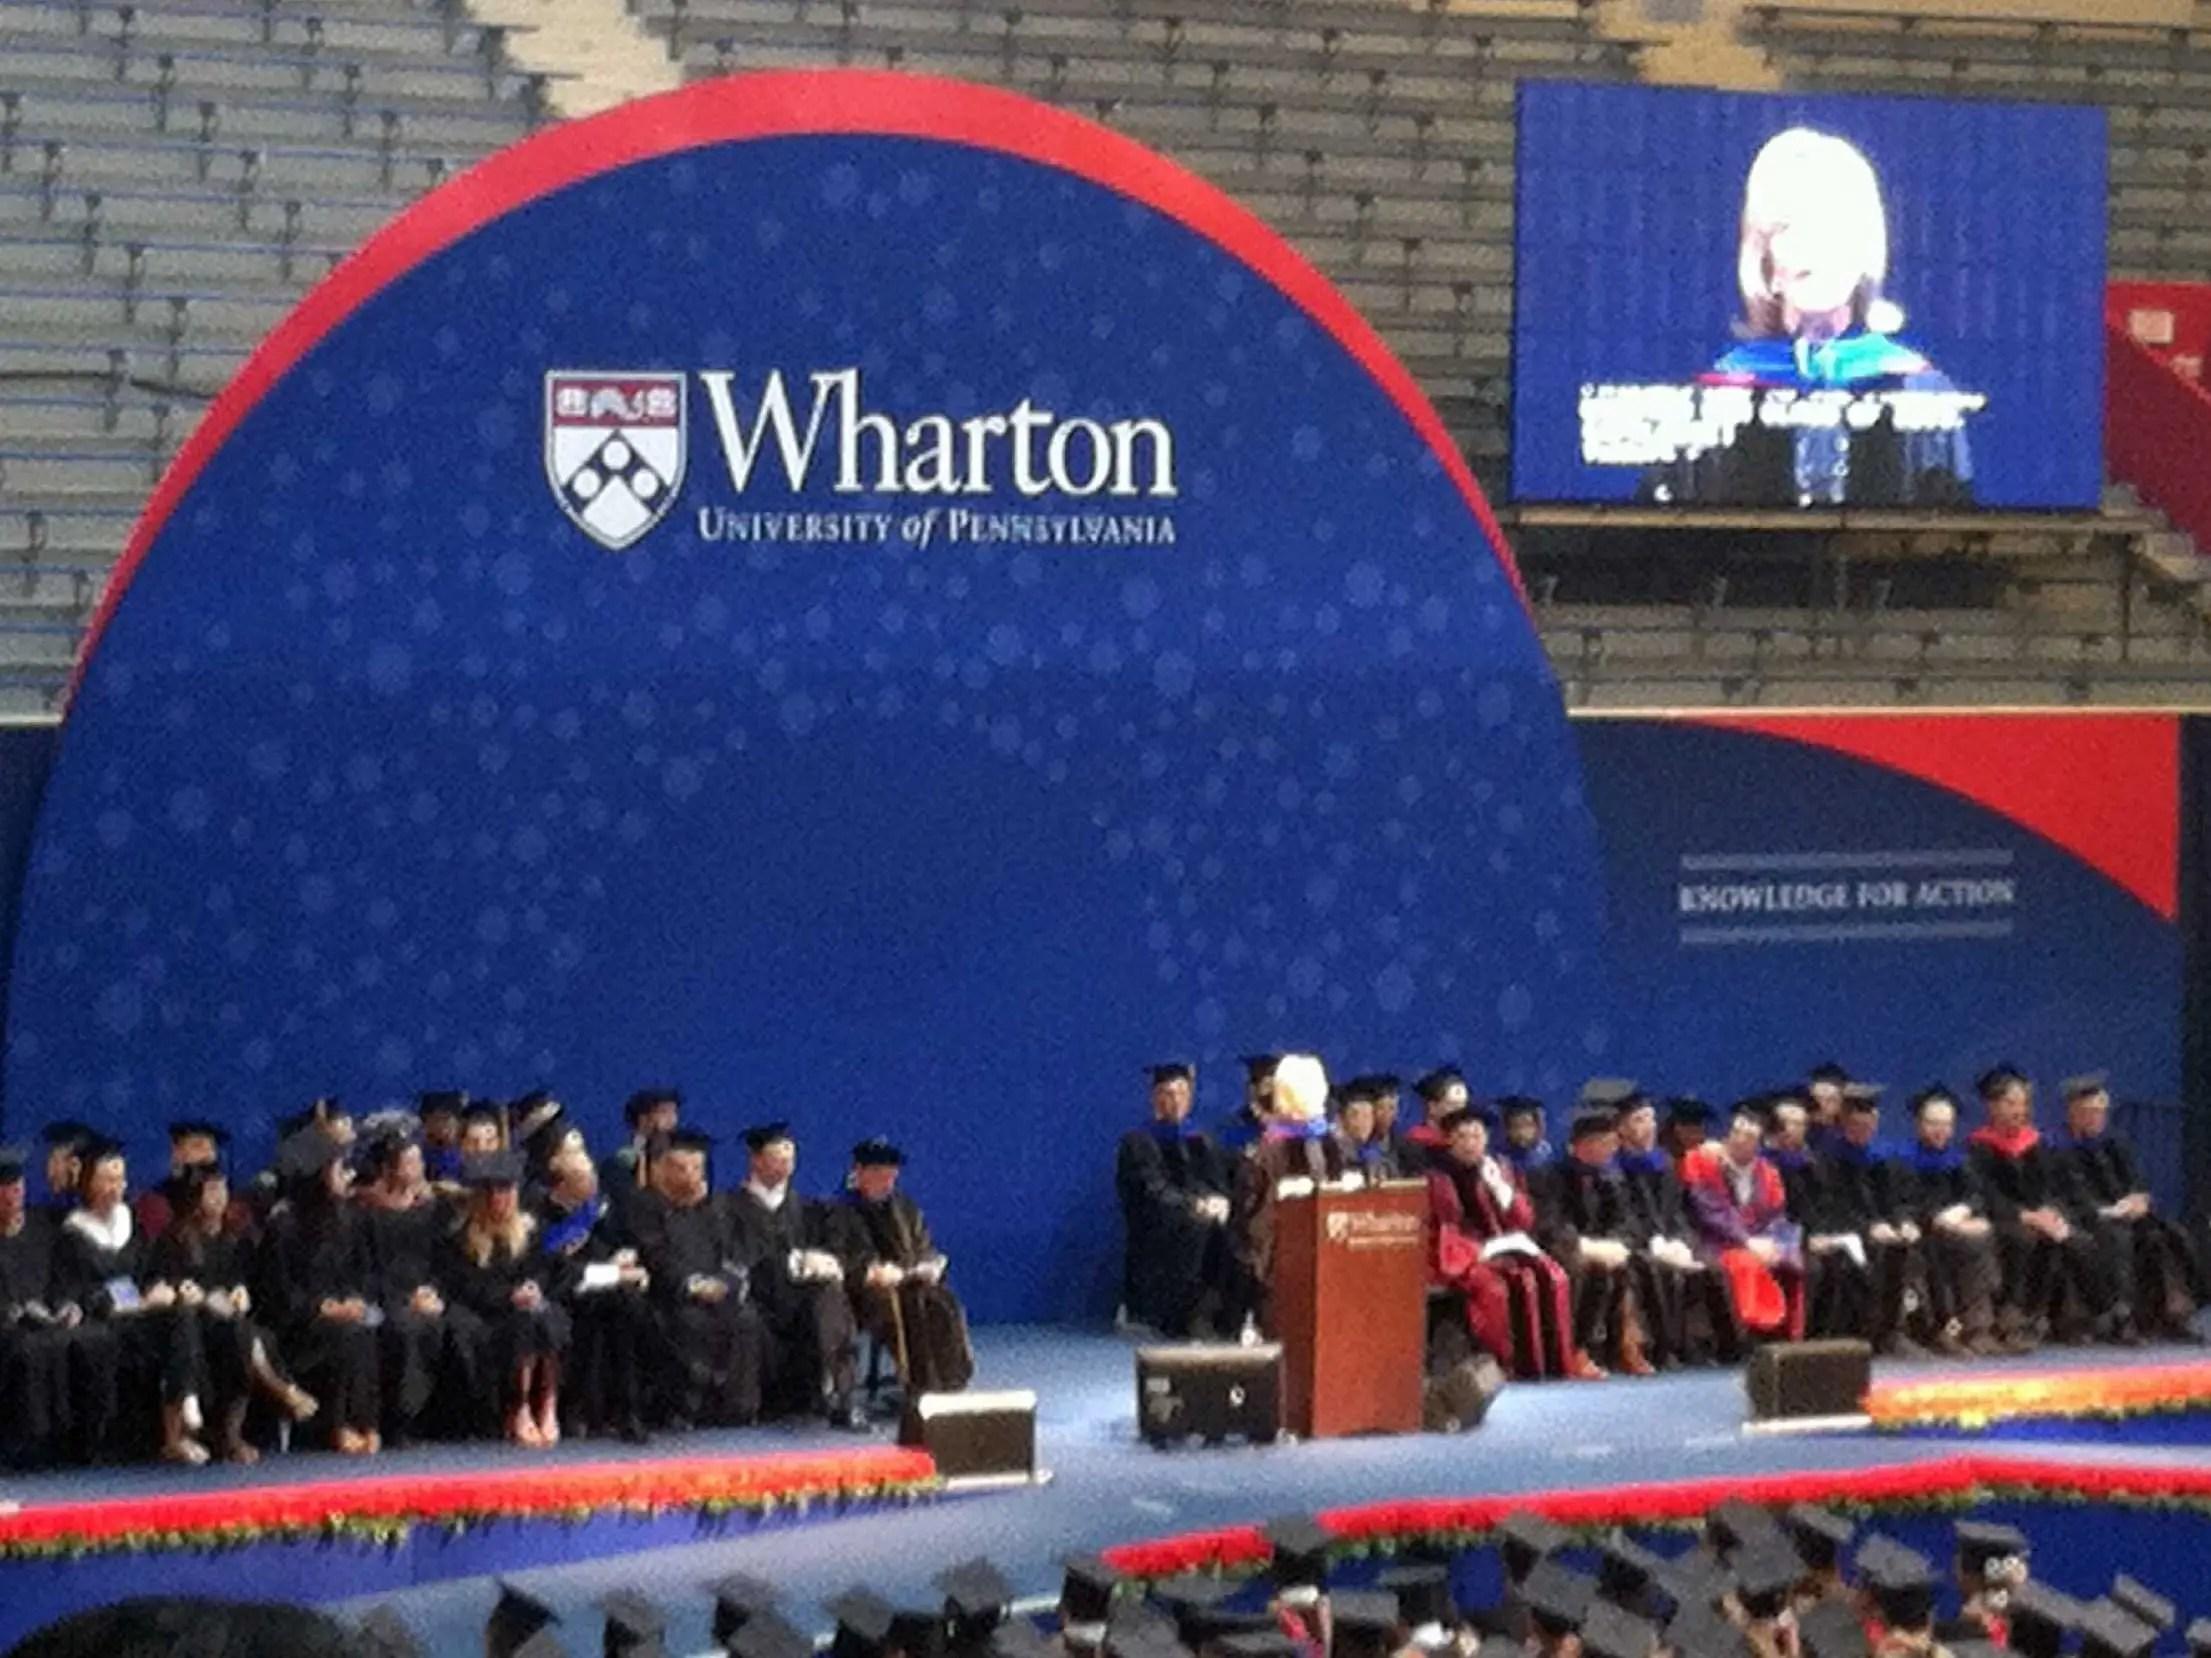 wharton university of pennsylvania graduation